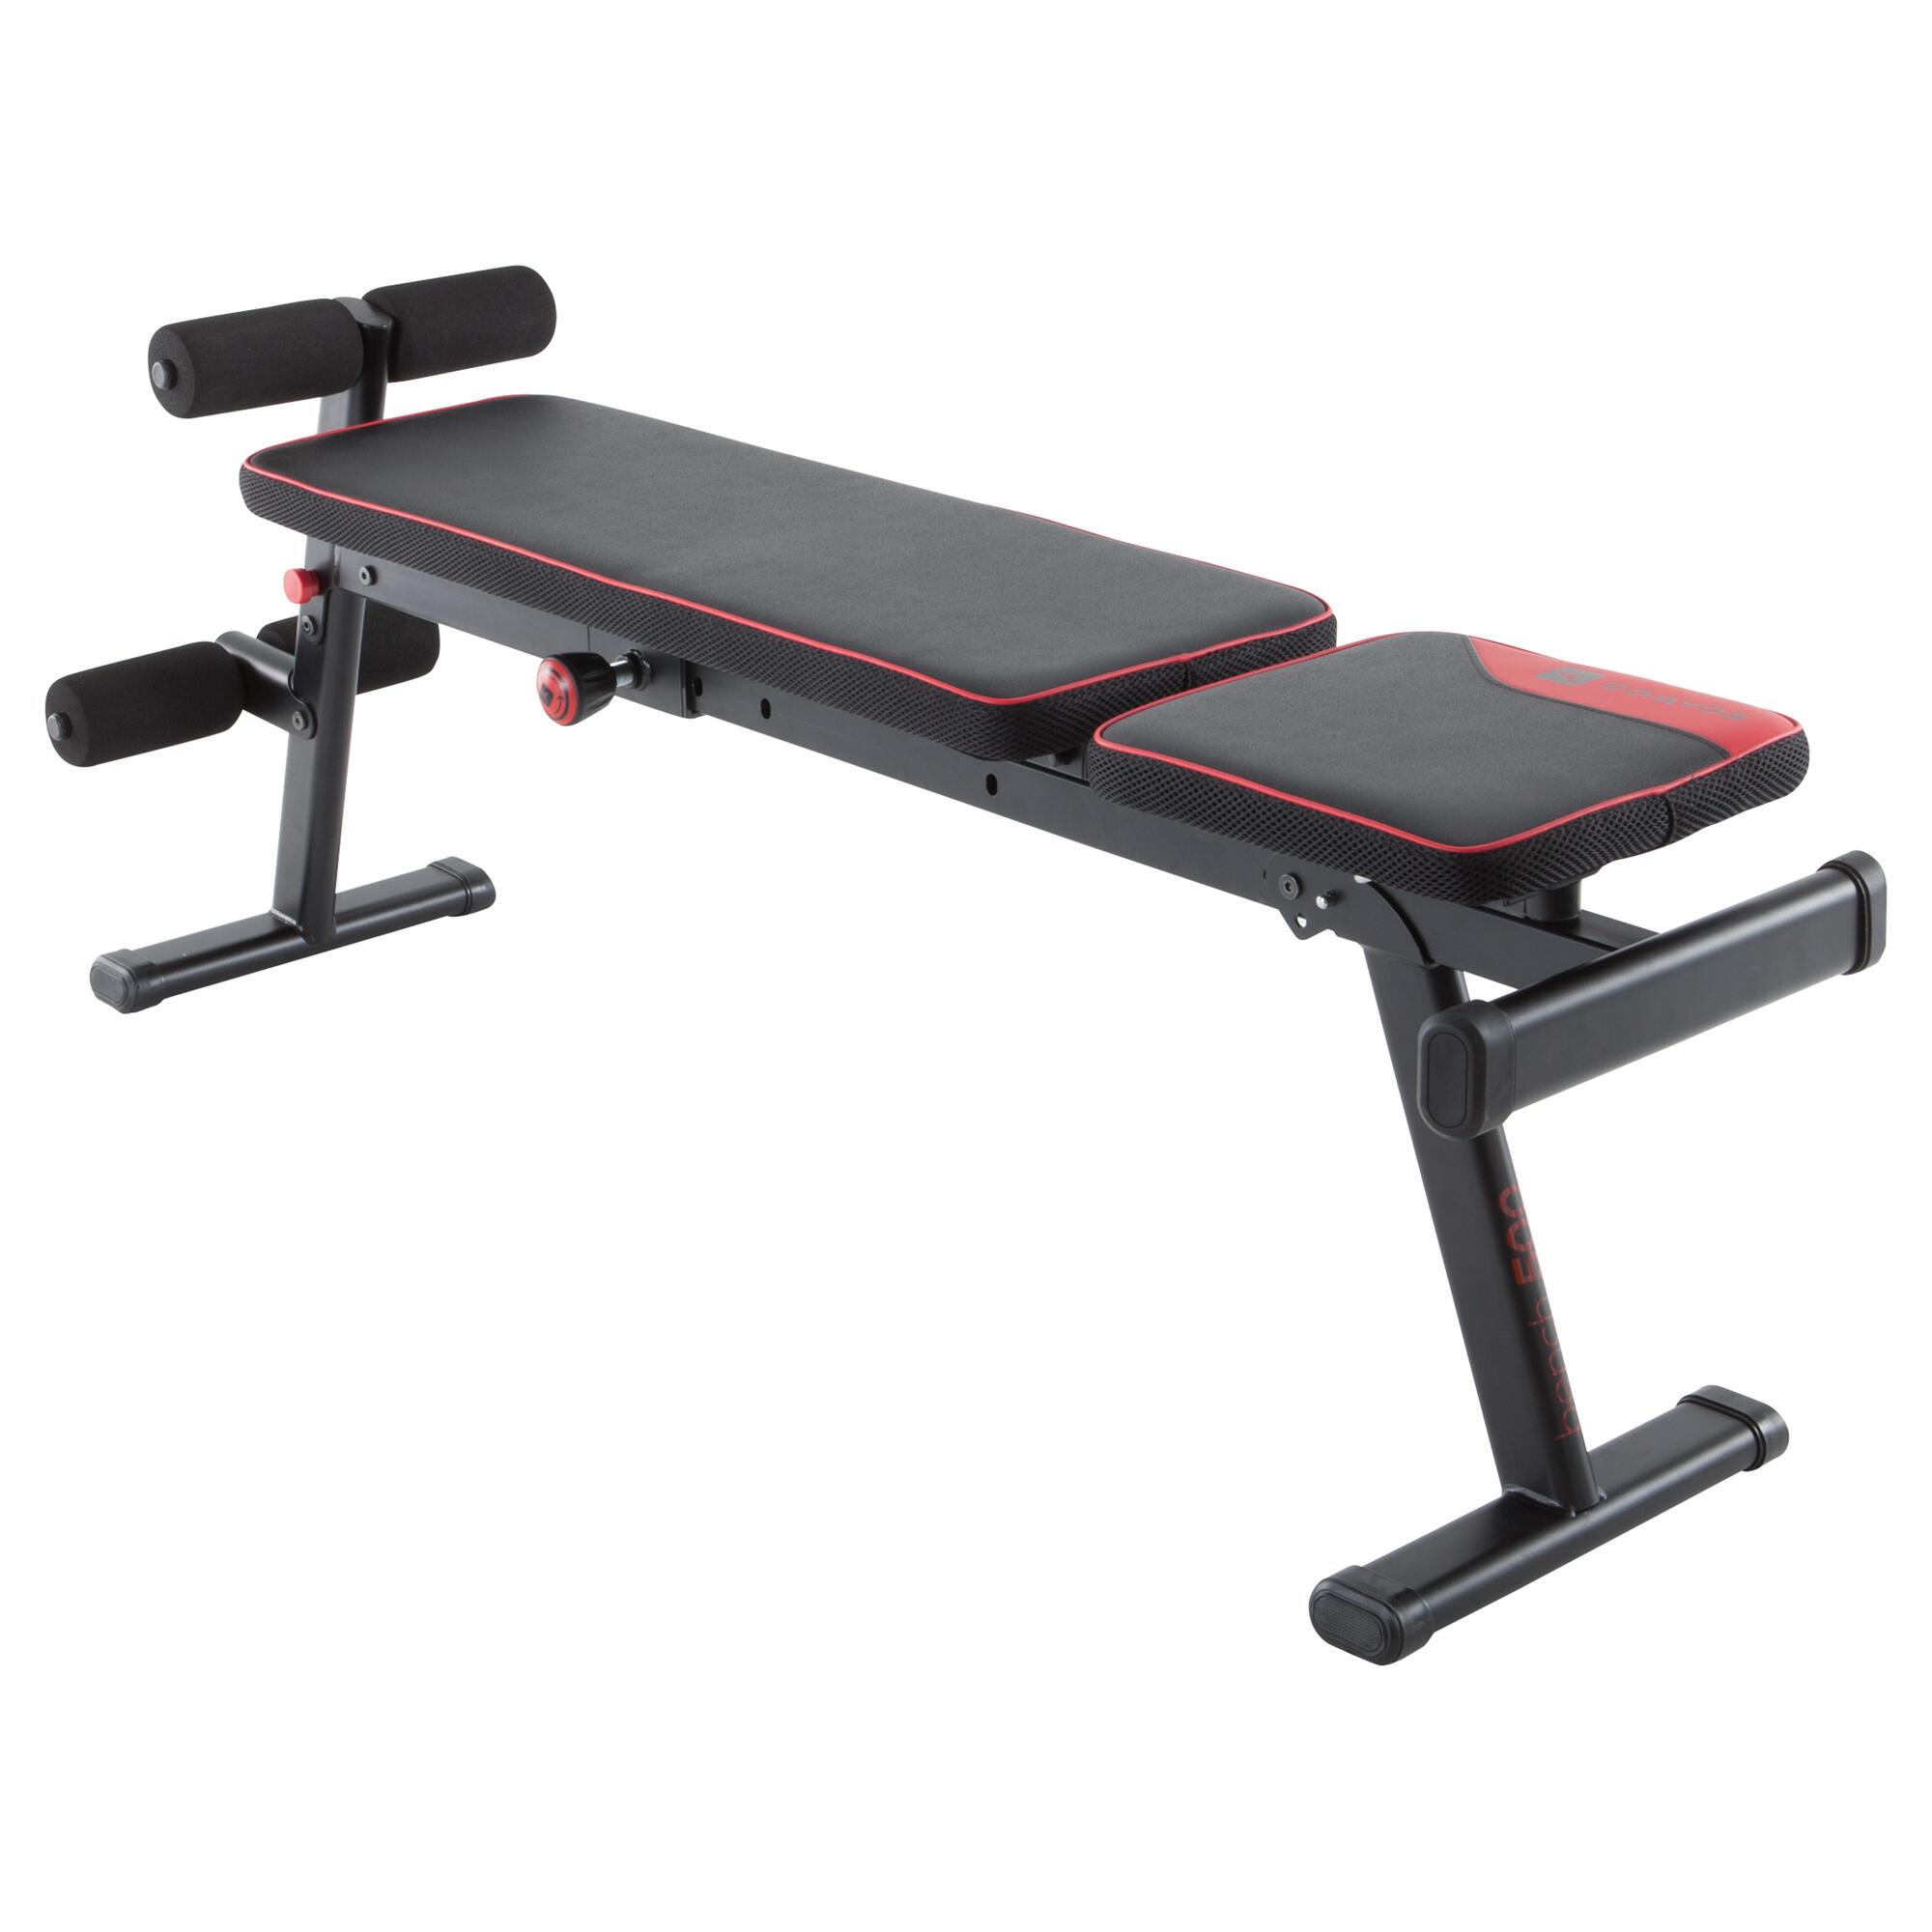 50f0d88e6b4f69 Panca bodybuilding 500 pieghevole e reclinabile | Domyos by Decathlon